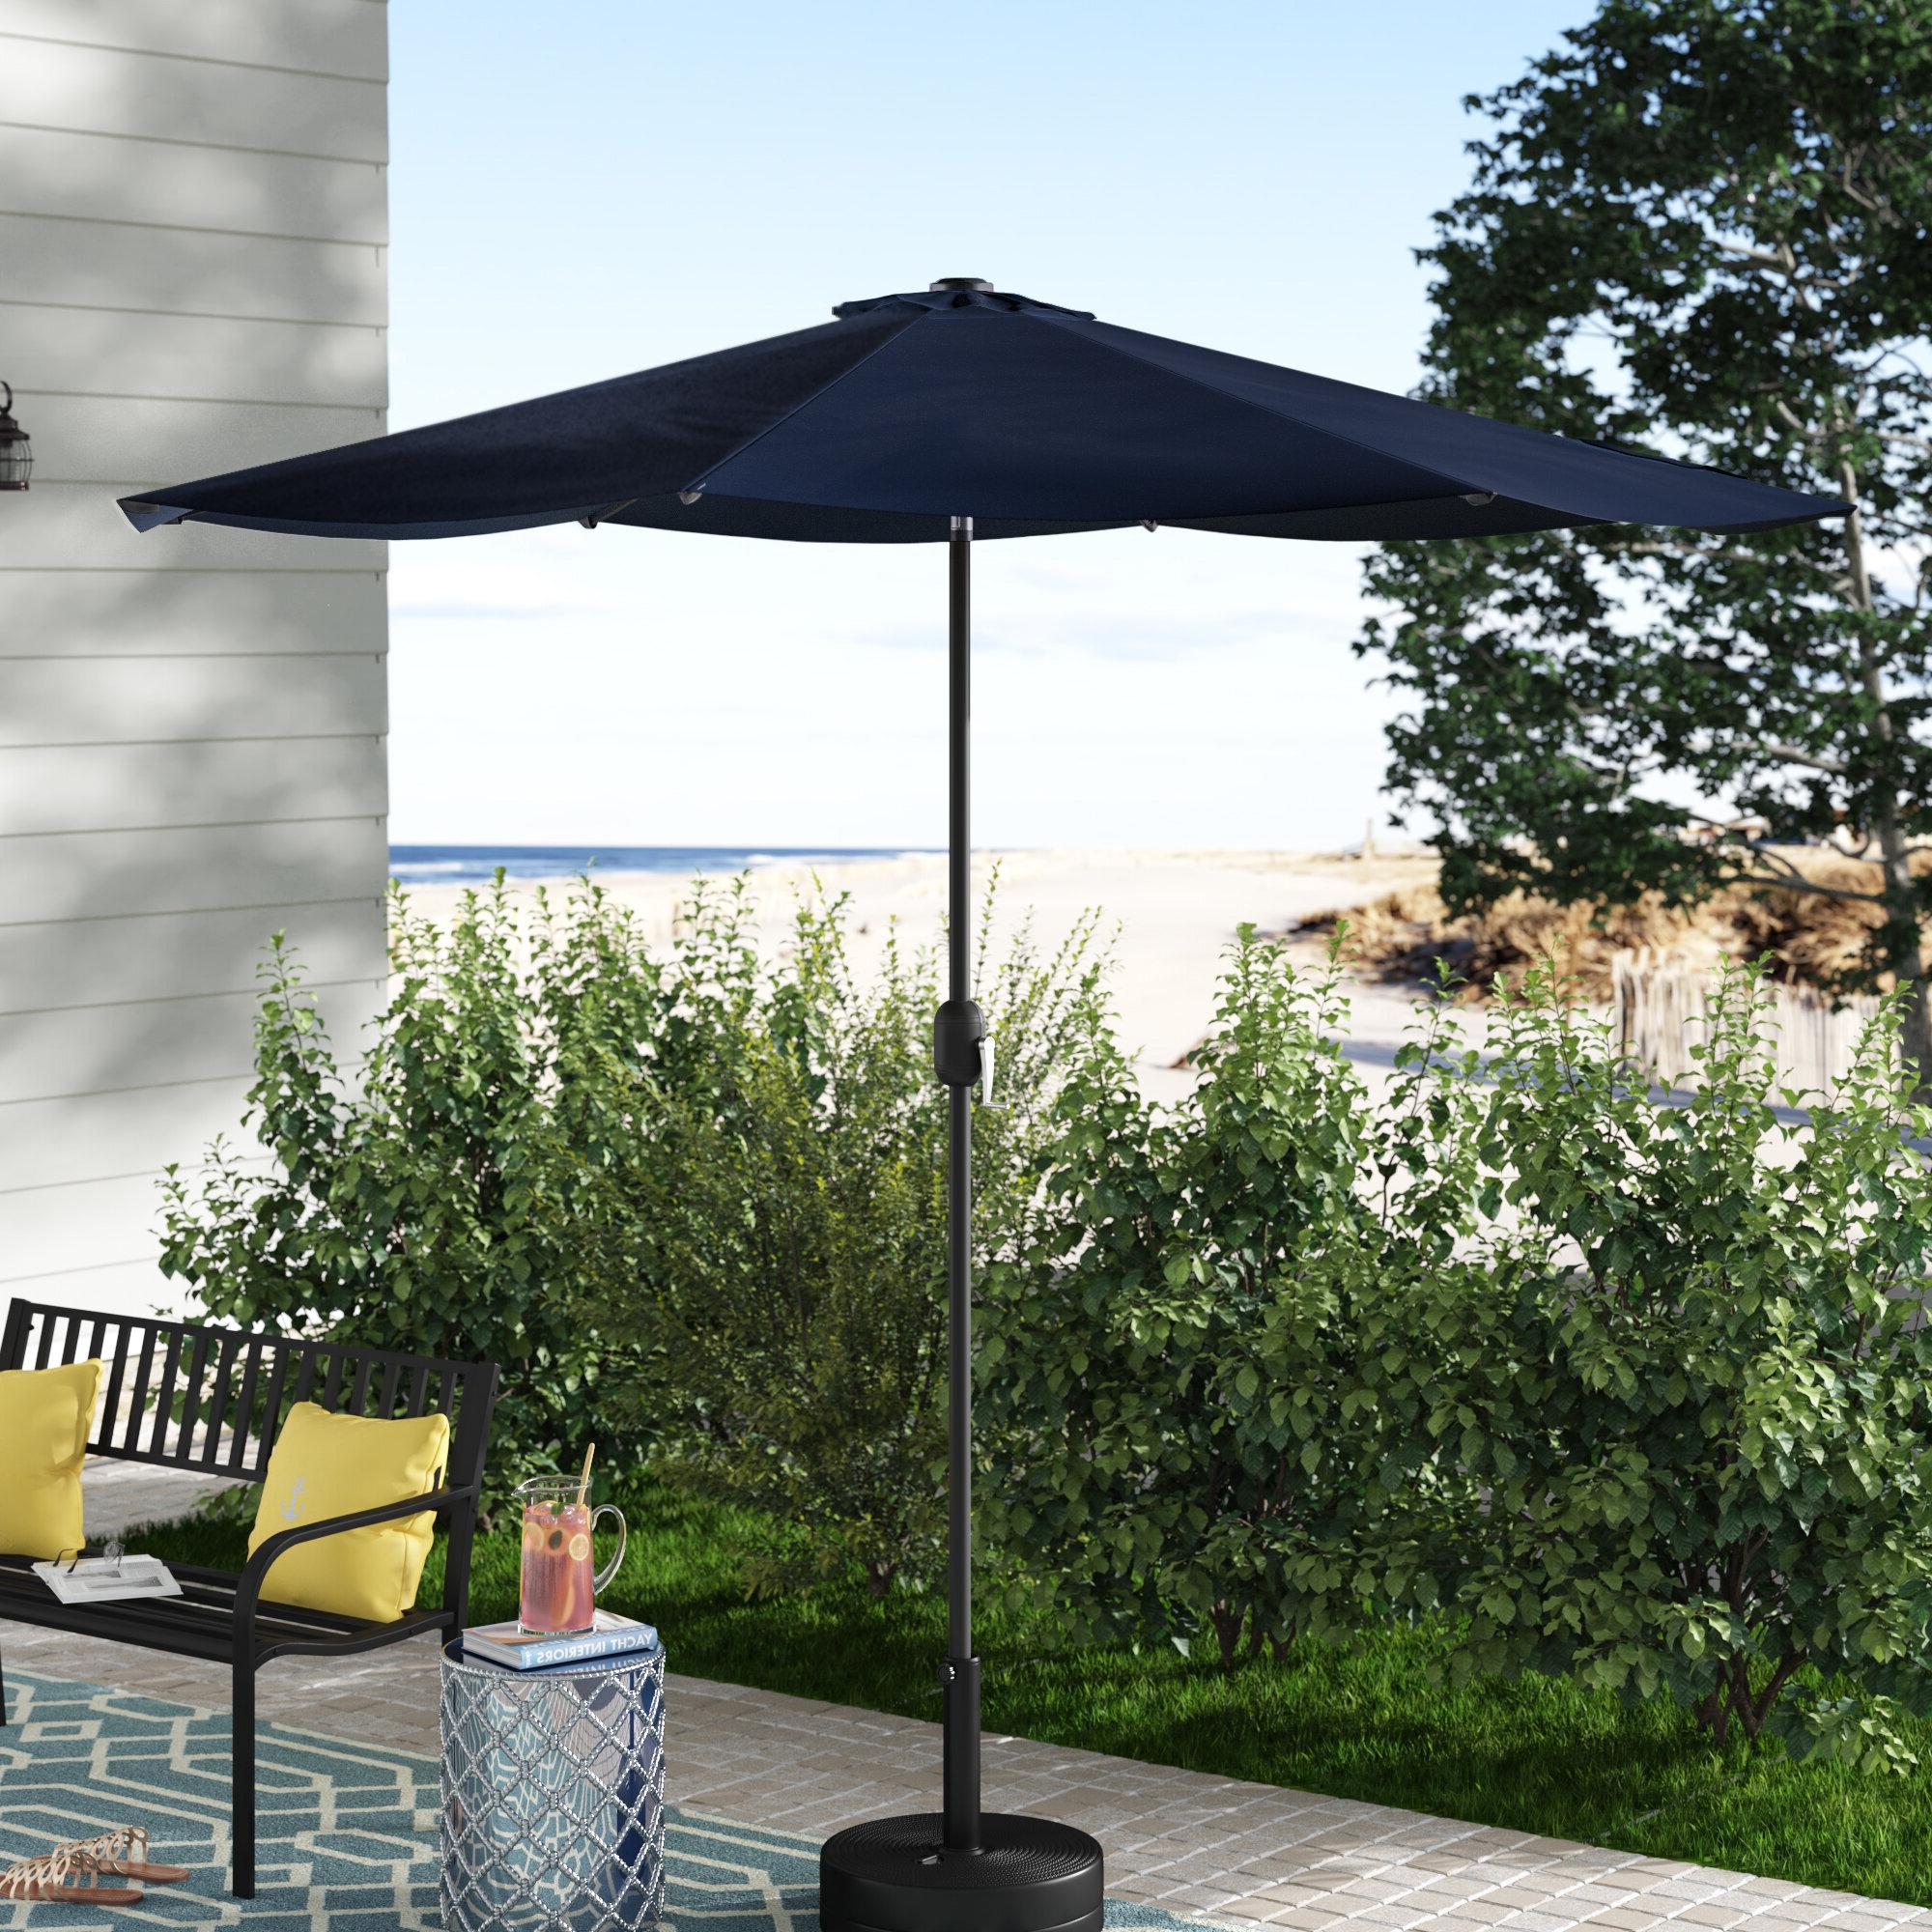 Julian 9' Market Sunbrella Umbrella Regarding 2019 Wiechmann Market Sunbrella Umbrellas (Gallery 7 of 20)